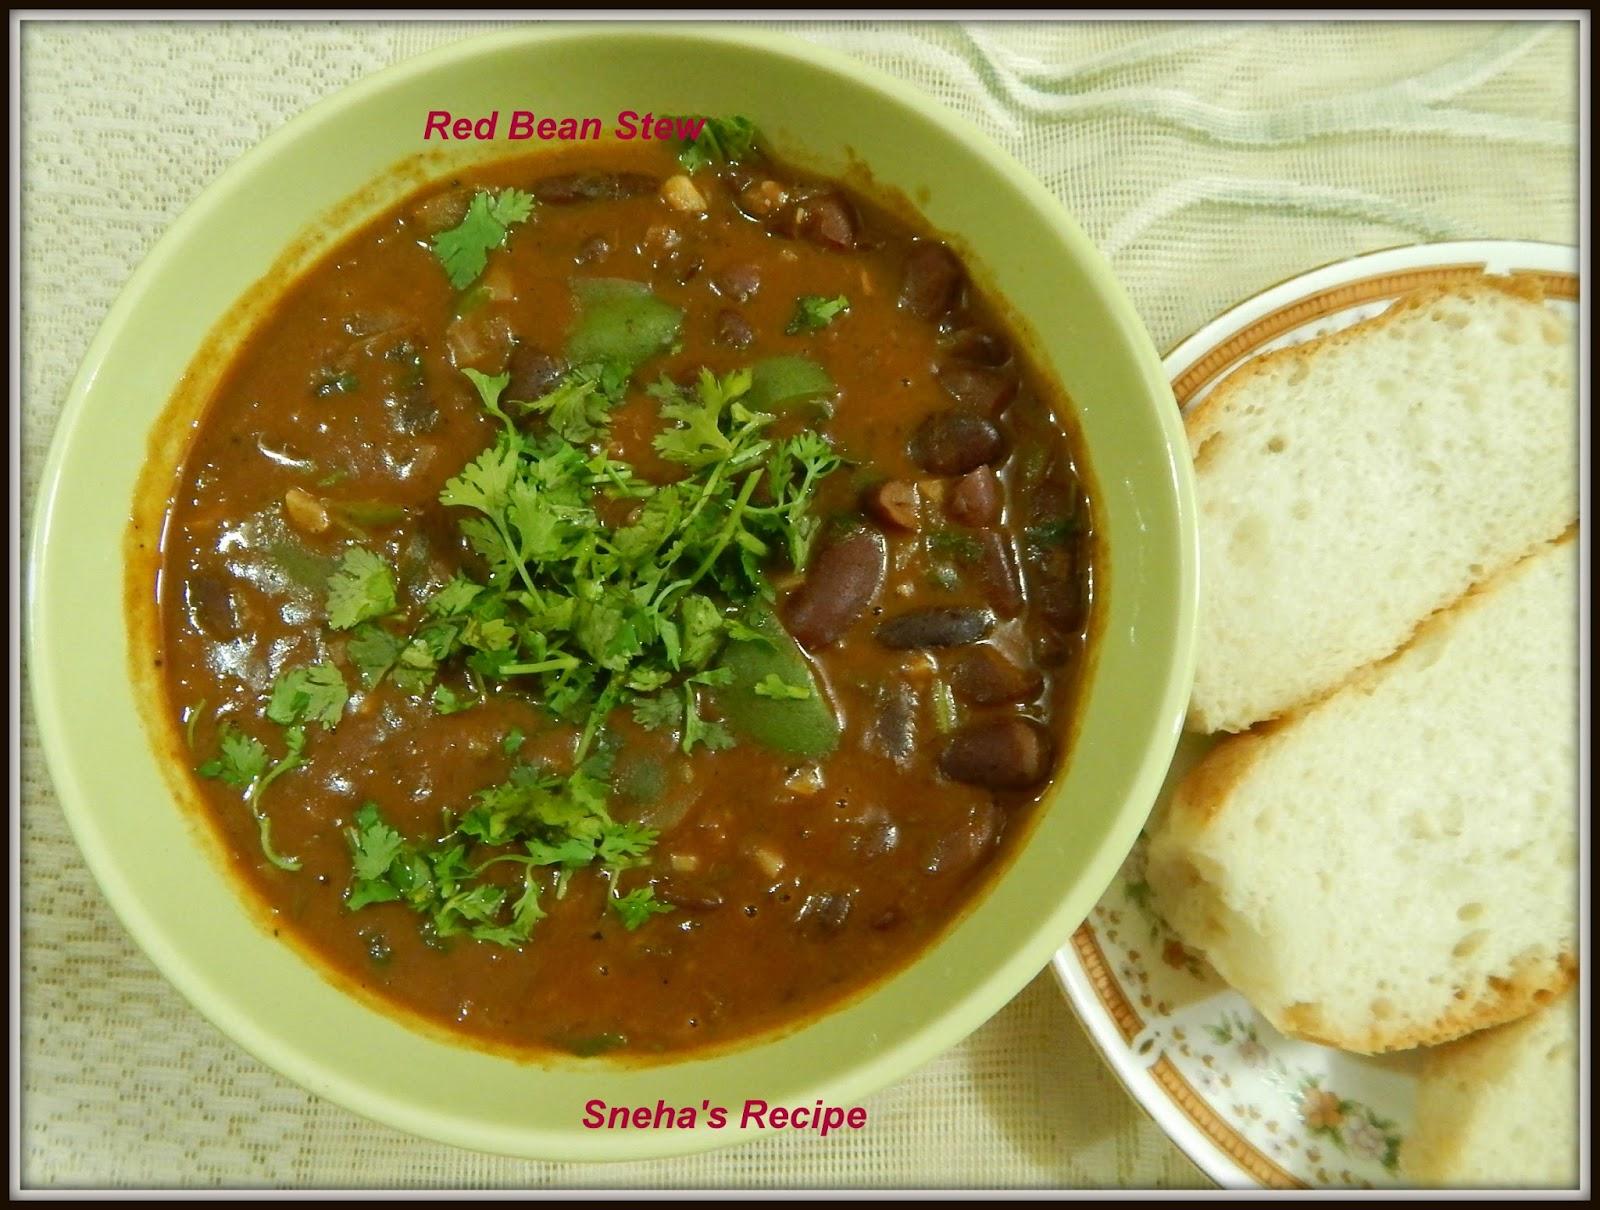 Red bean stew a vegetarian a yemeni stew snehas recipe labels vegetables yemeni rajma mena cooking club forumfinder Gallery